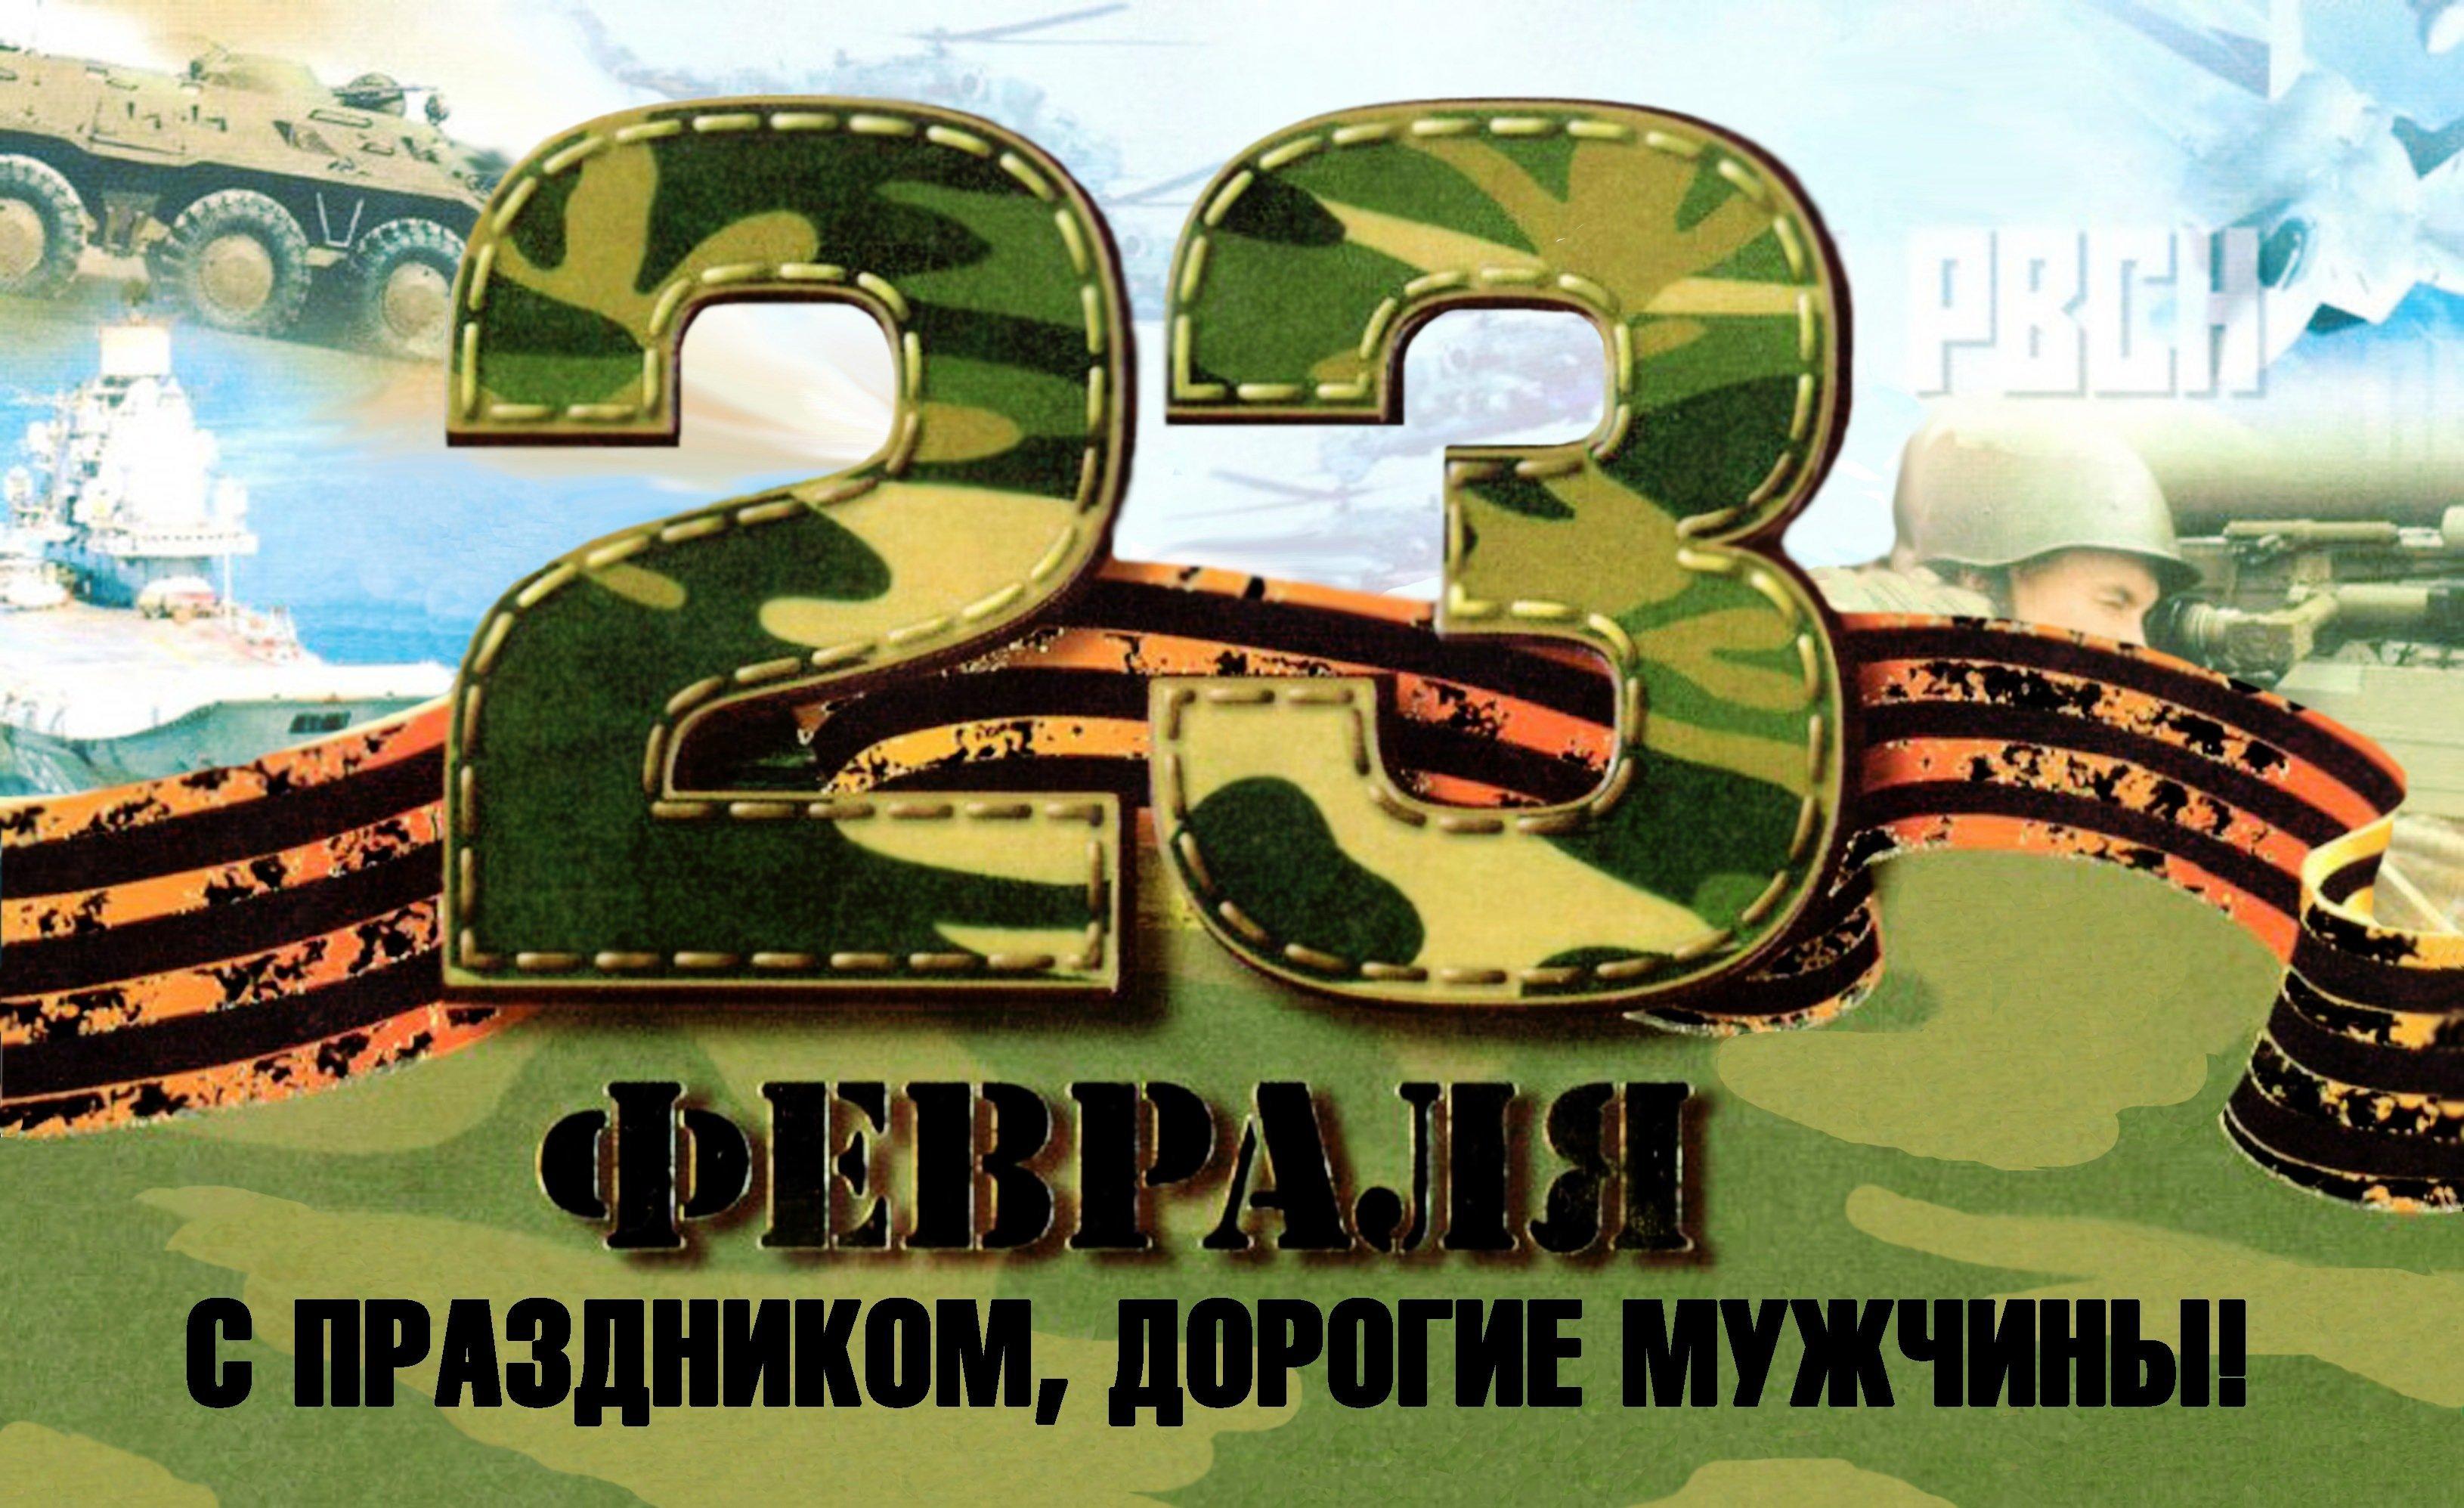 http://sa.uploads.ru/JpkR5.jpg